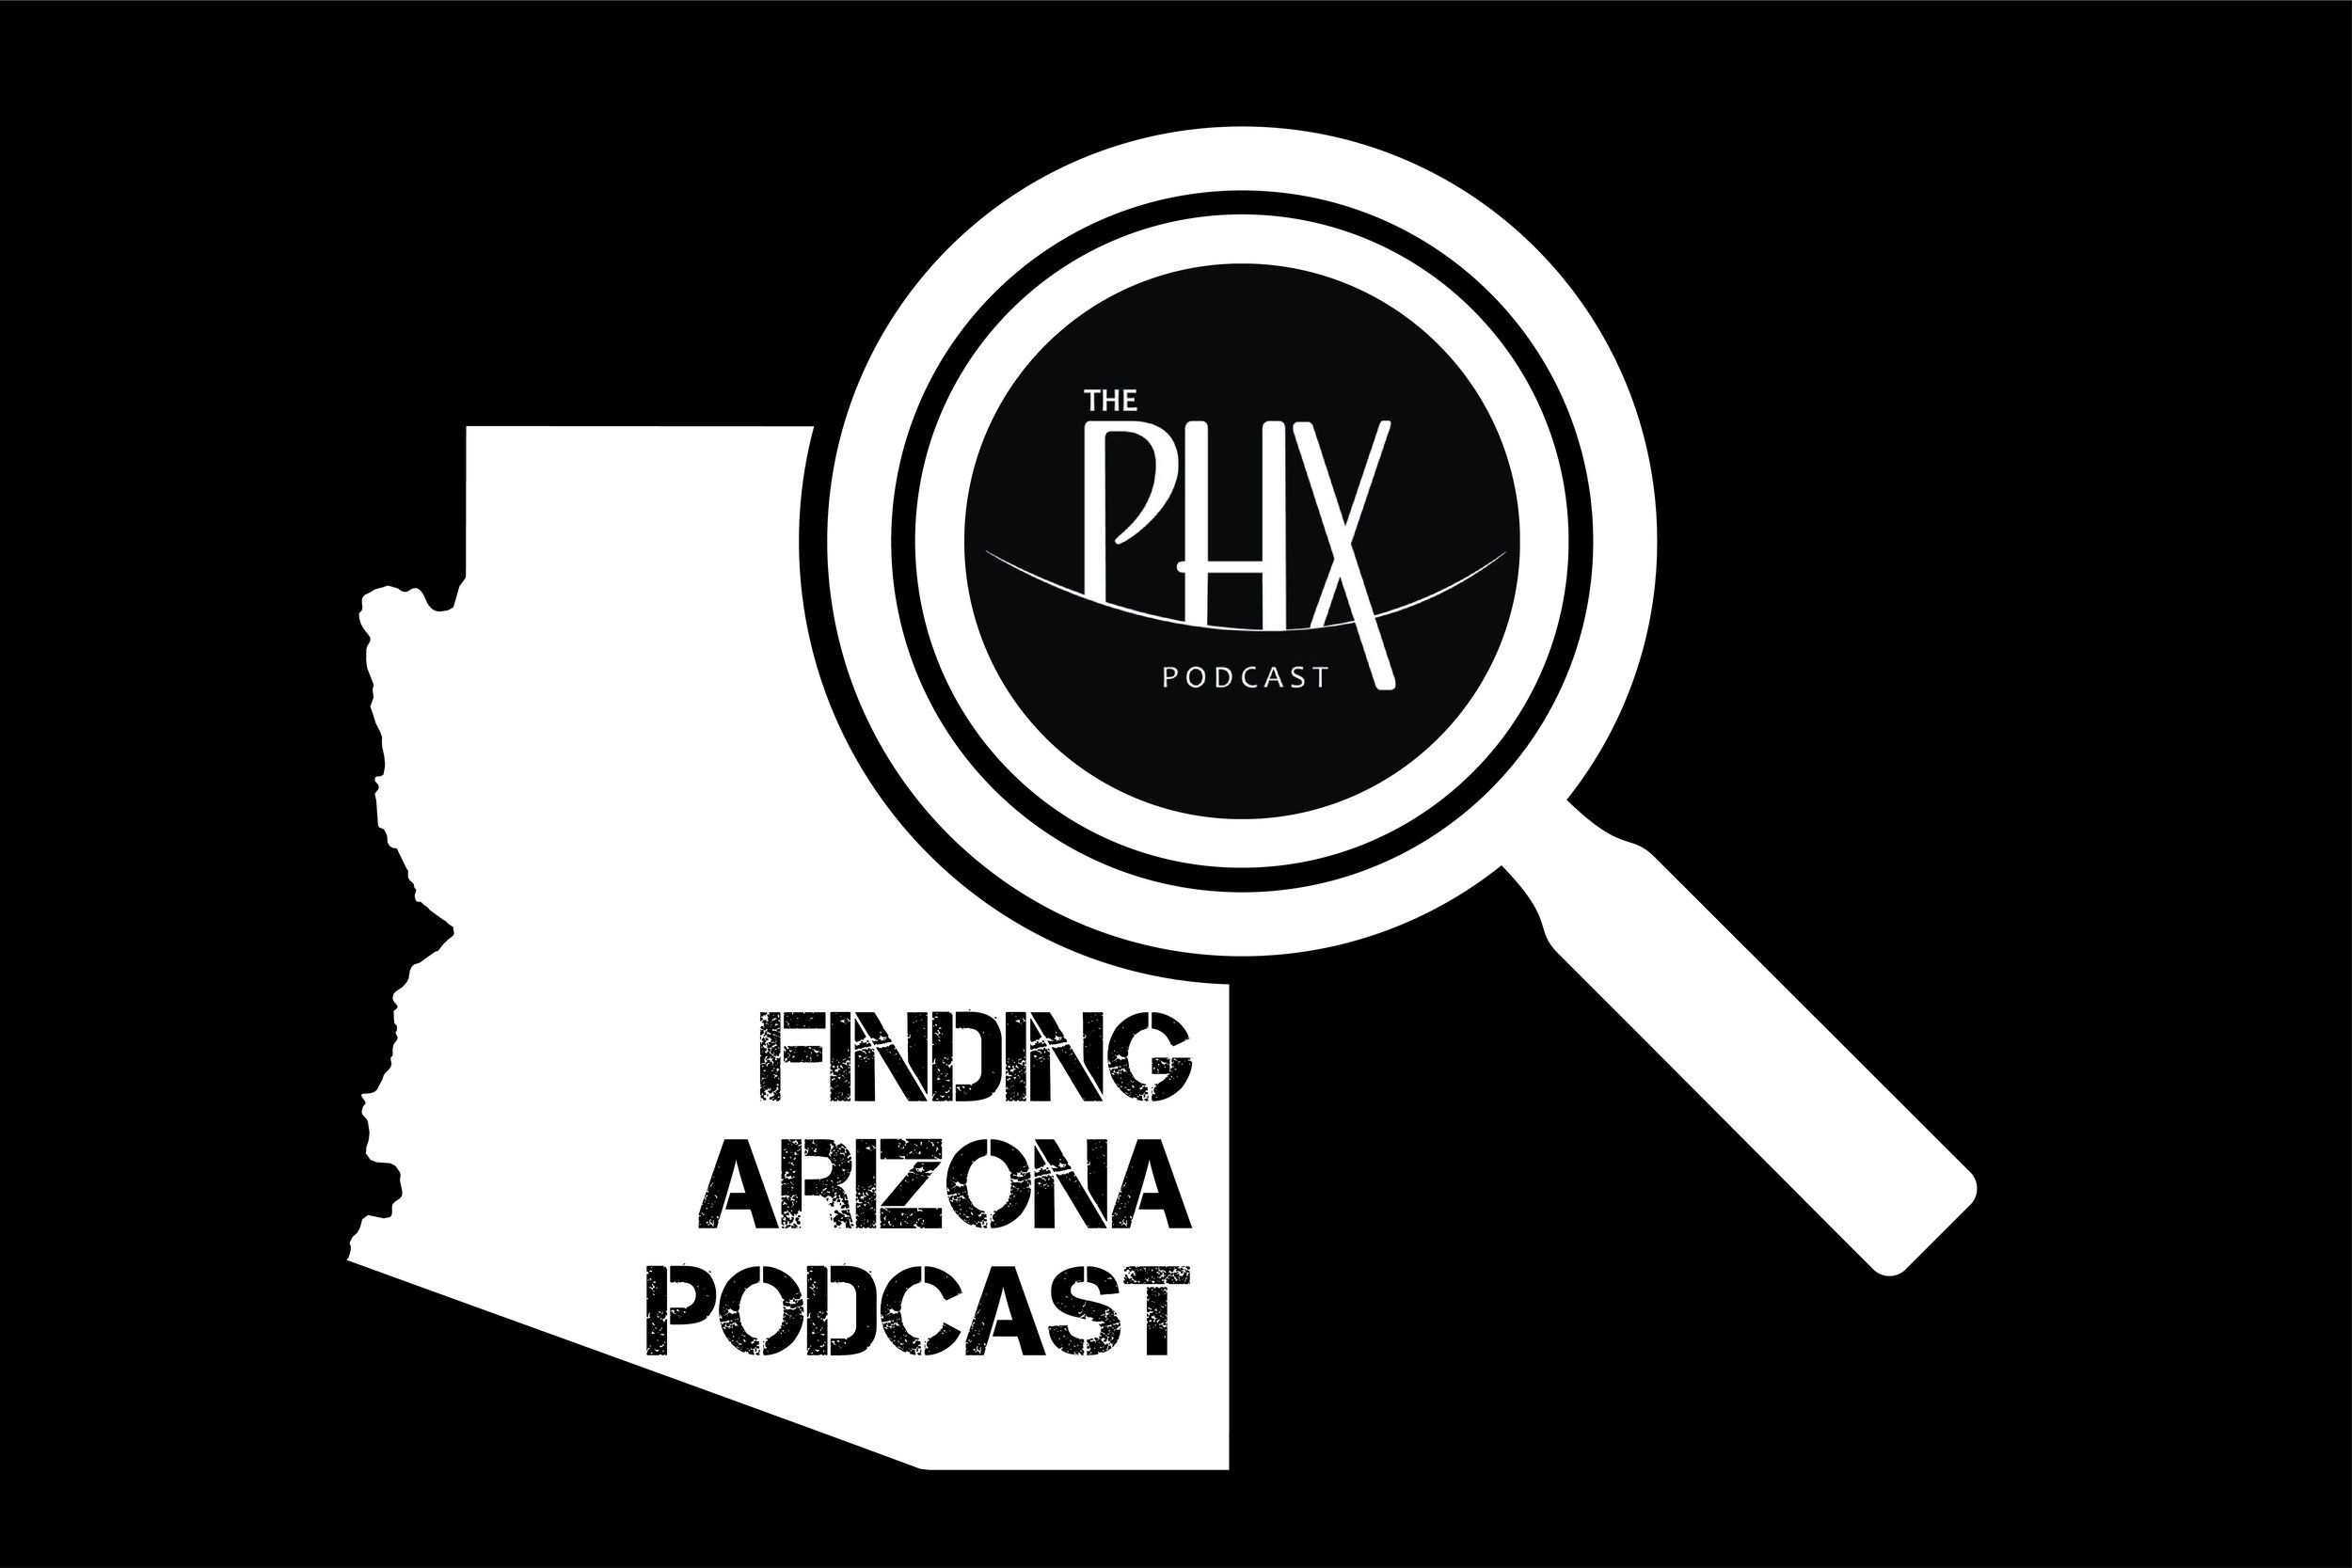 PodCastLogo-PHXpodcast.jpg